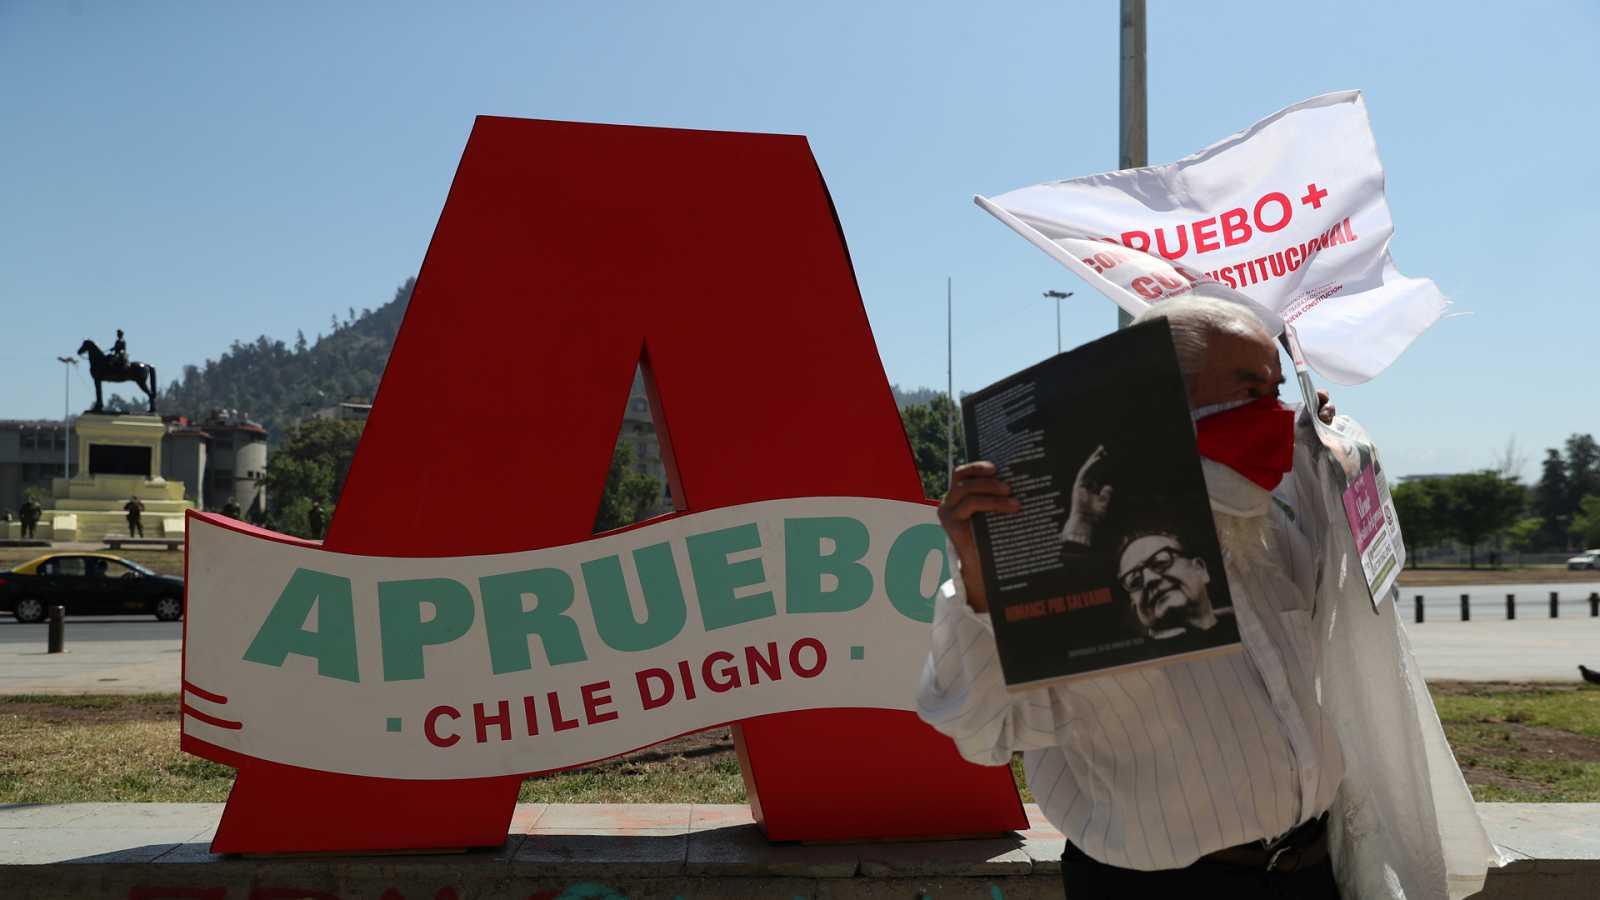 Hora América - Referéndum constitucional en Chile - 22/10/20 - escuchar ahora